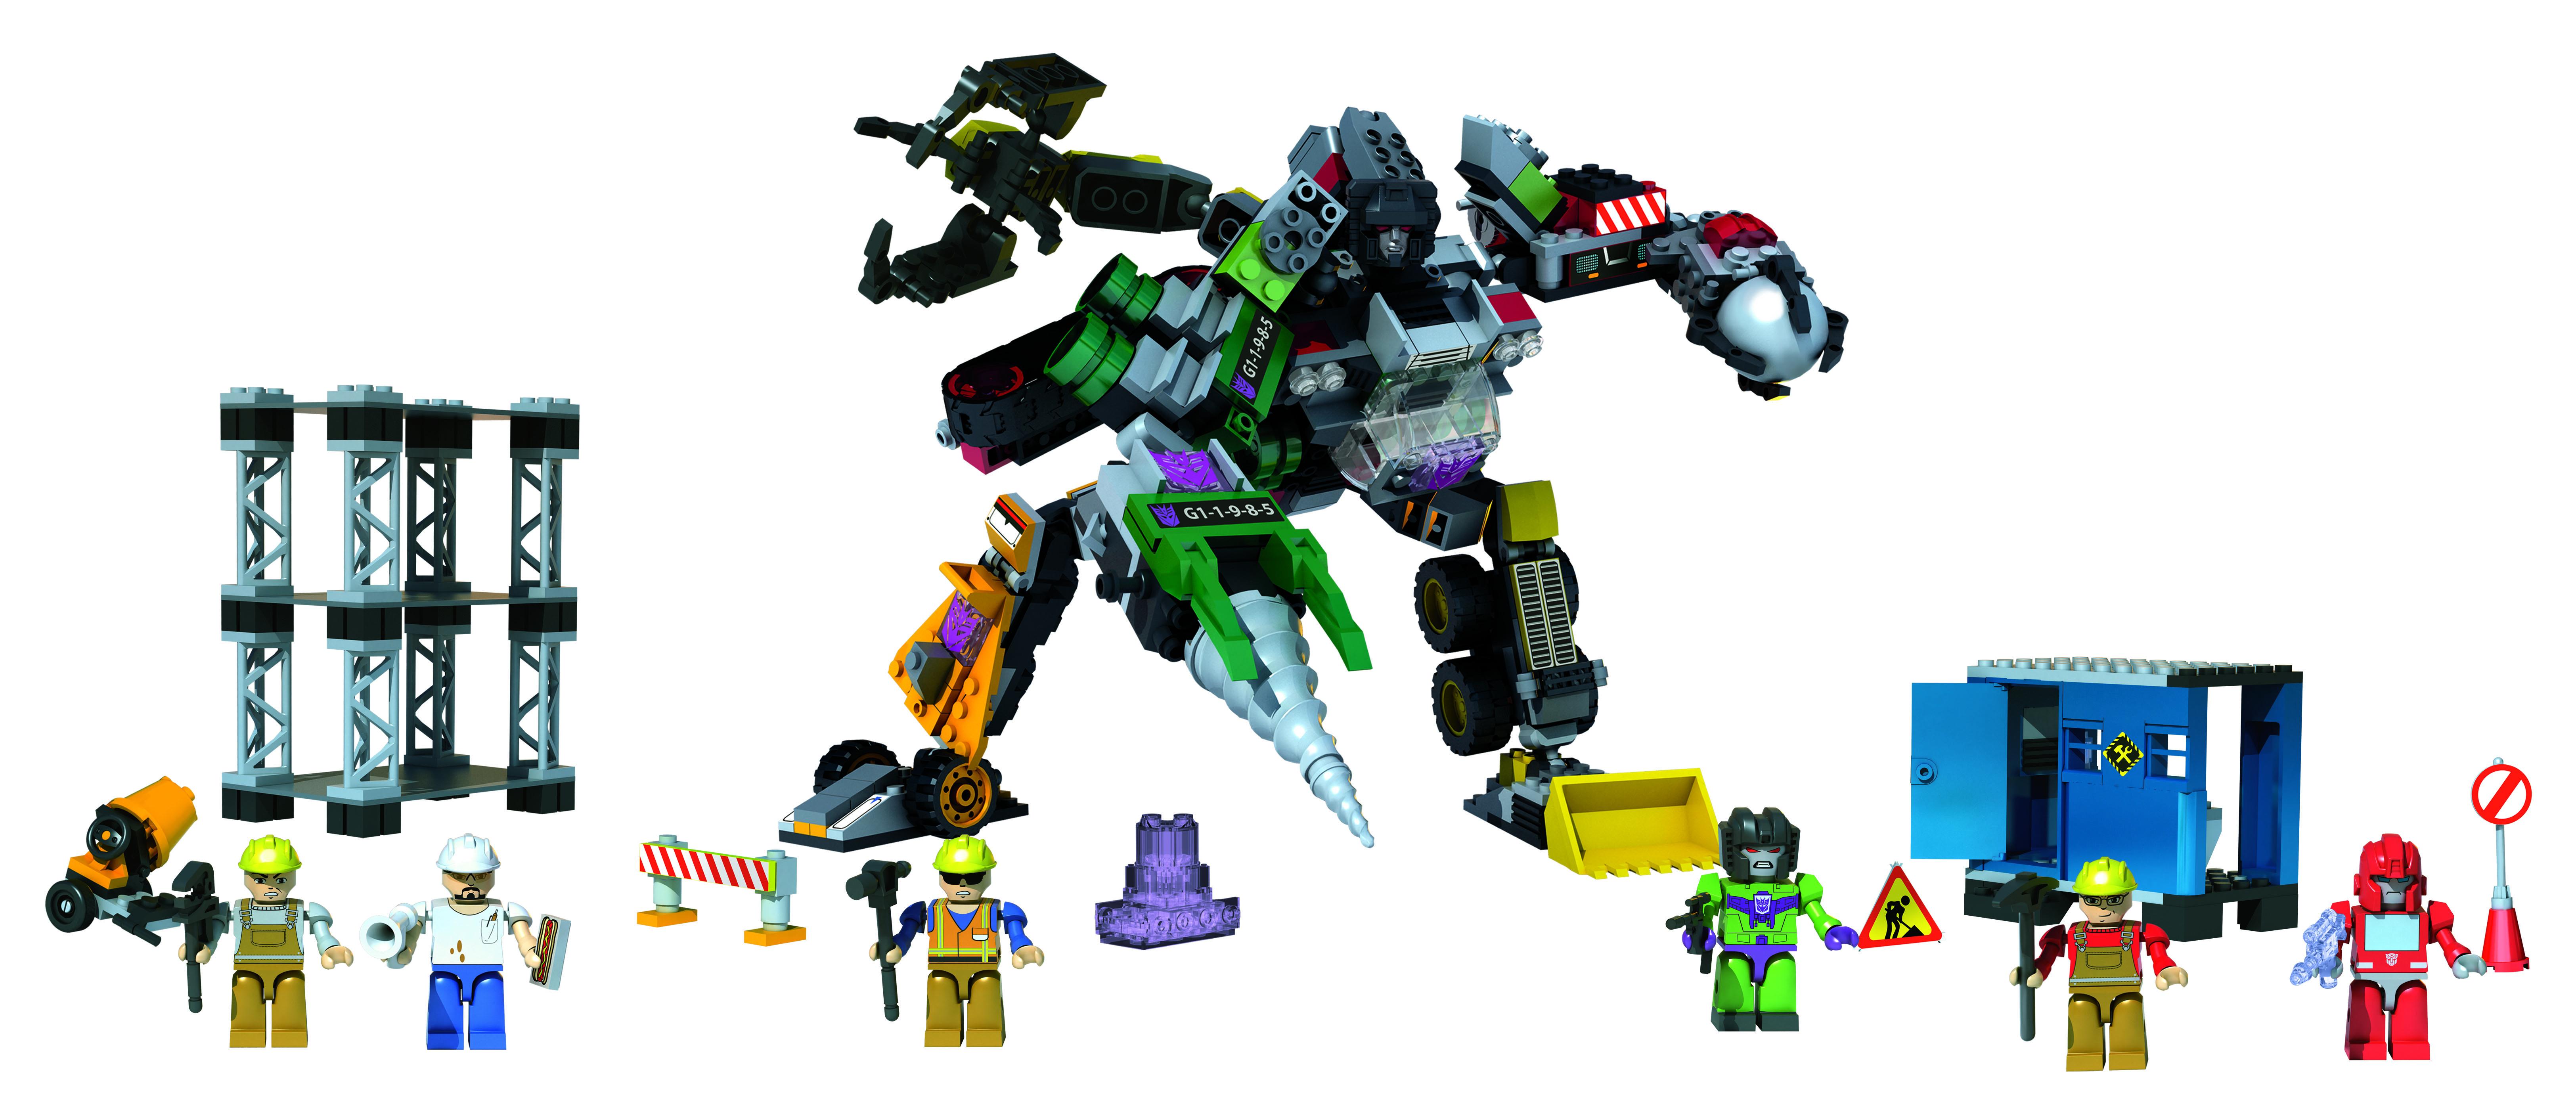 Kreo Transformers Decepticon Replicator Playset Build ...